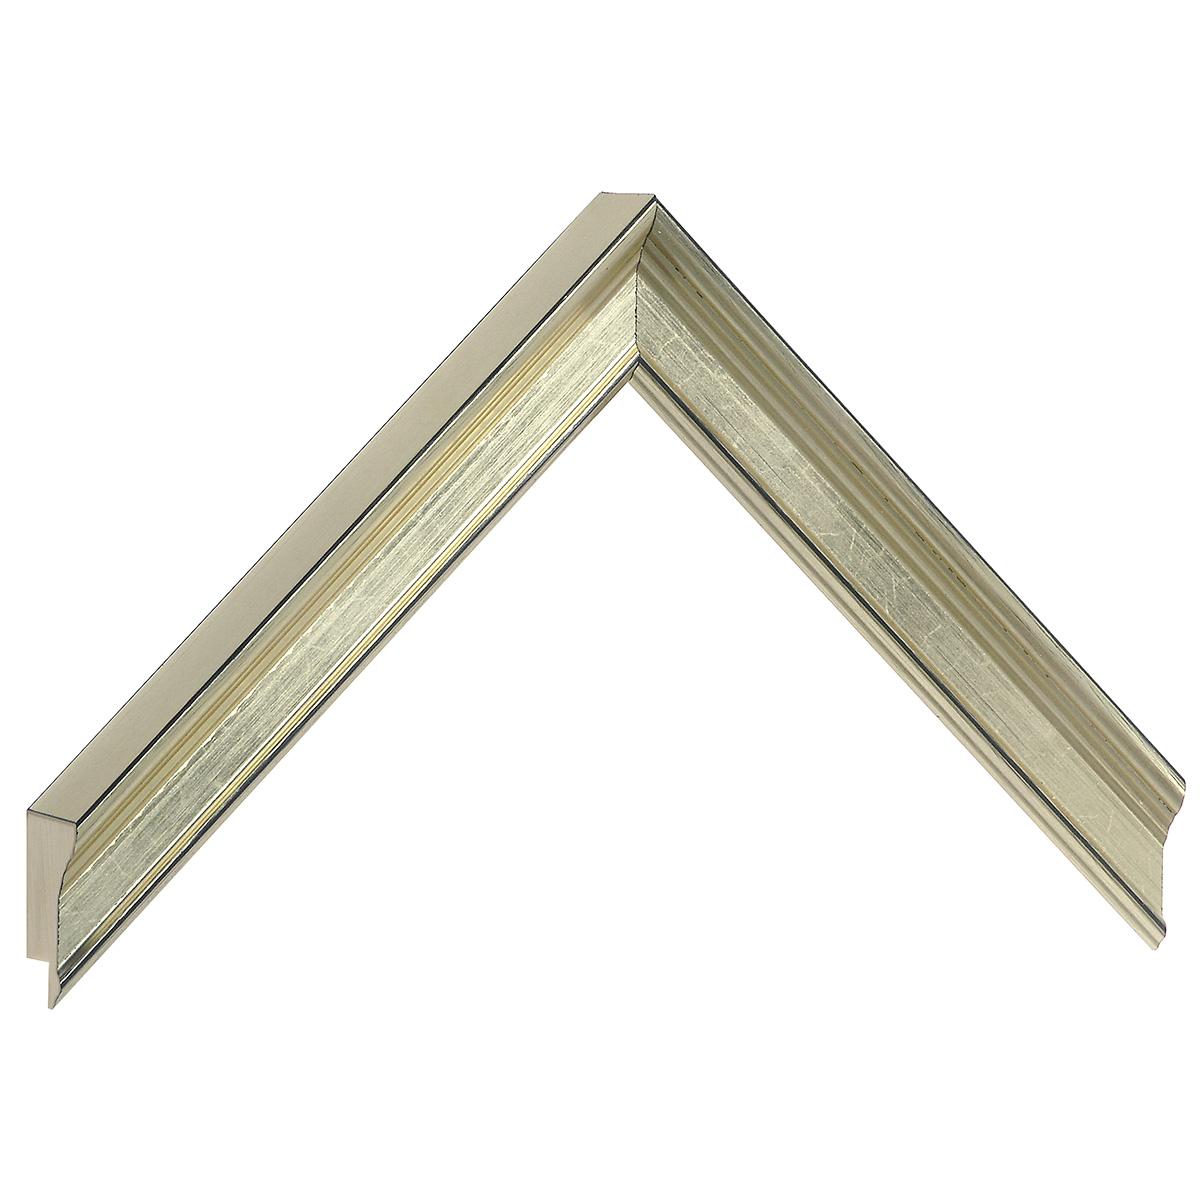 Moulding finger joint pine - width 23mm height 25 - platinum